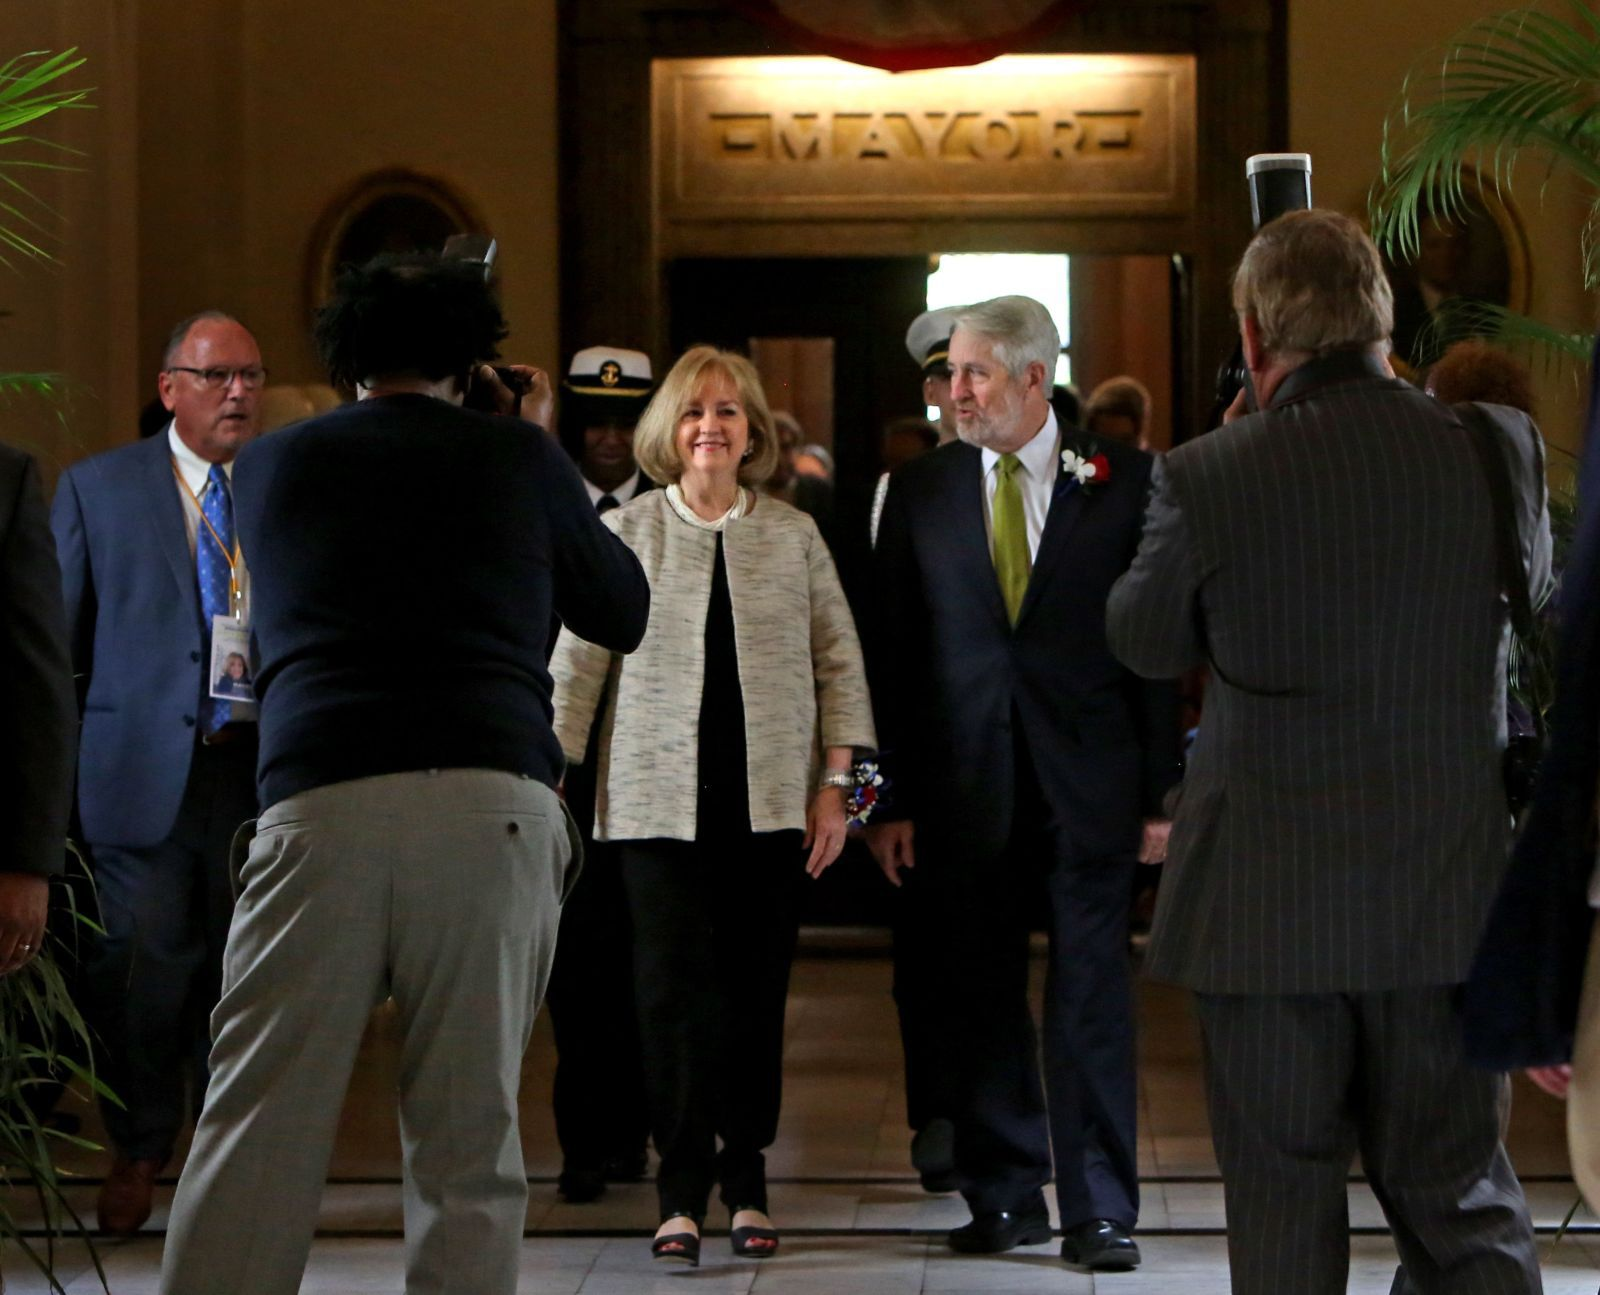 Krewson Sworn In As St. Louisu0027 46th And First Female Mayor